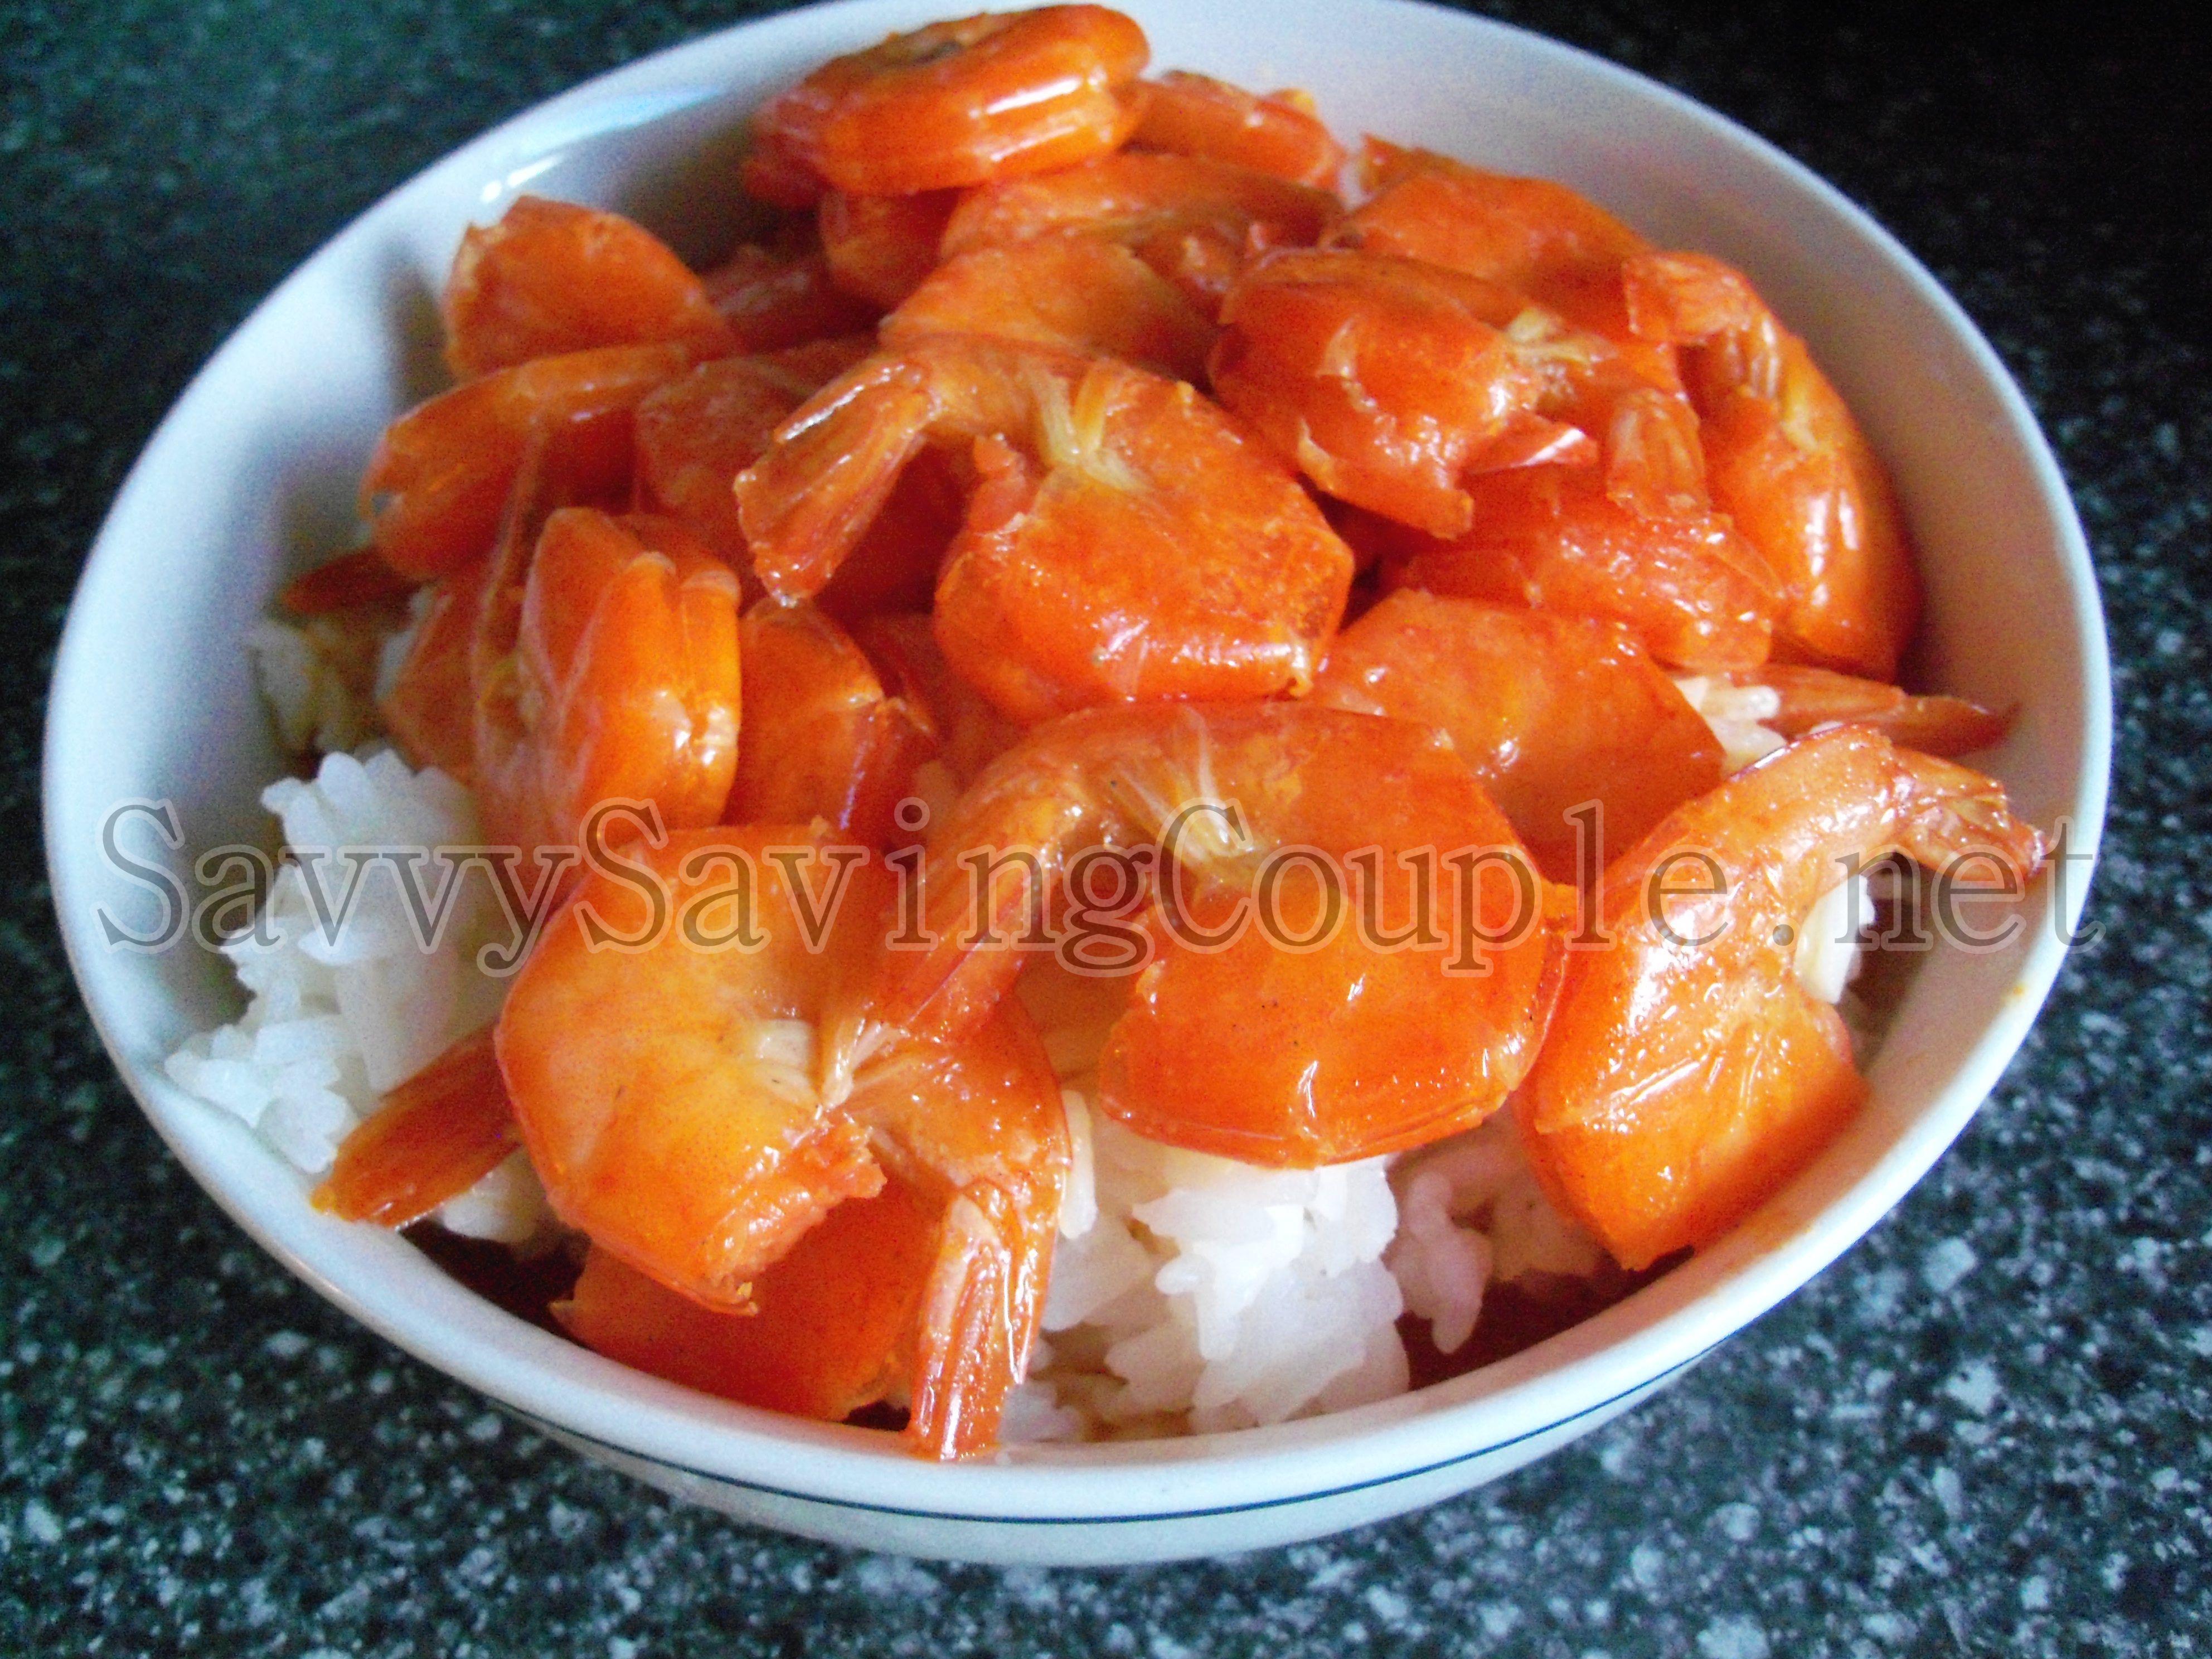 Shrimp Mozambique Is A Portuguese Comfort Food Shrimp Mozambique Portuguese Recipes Recipes